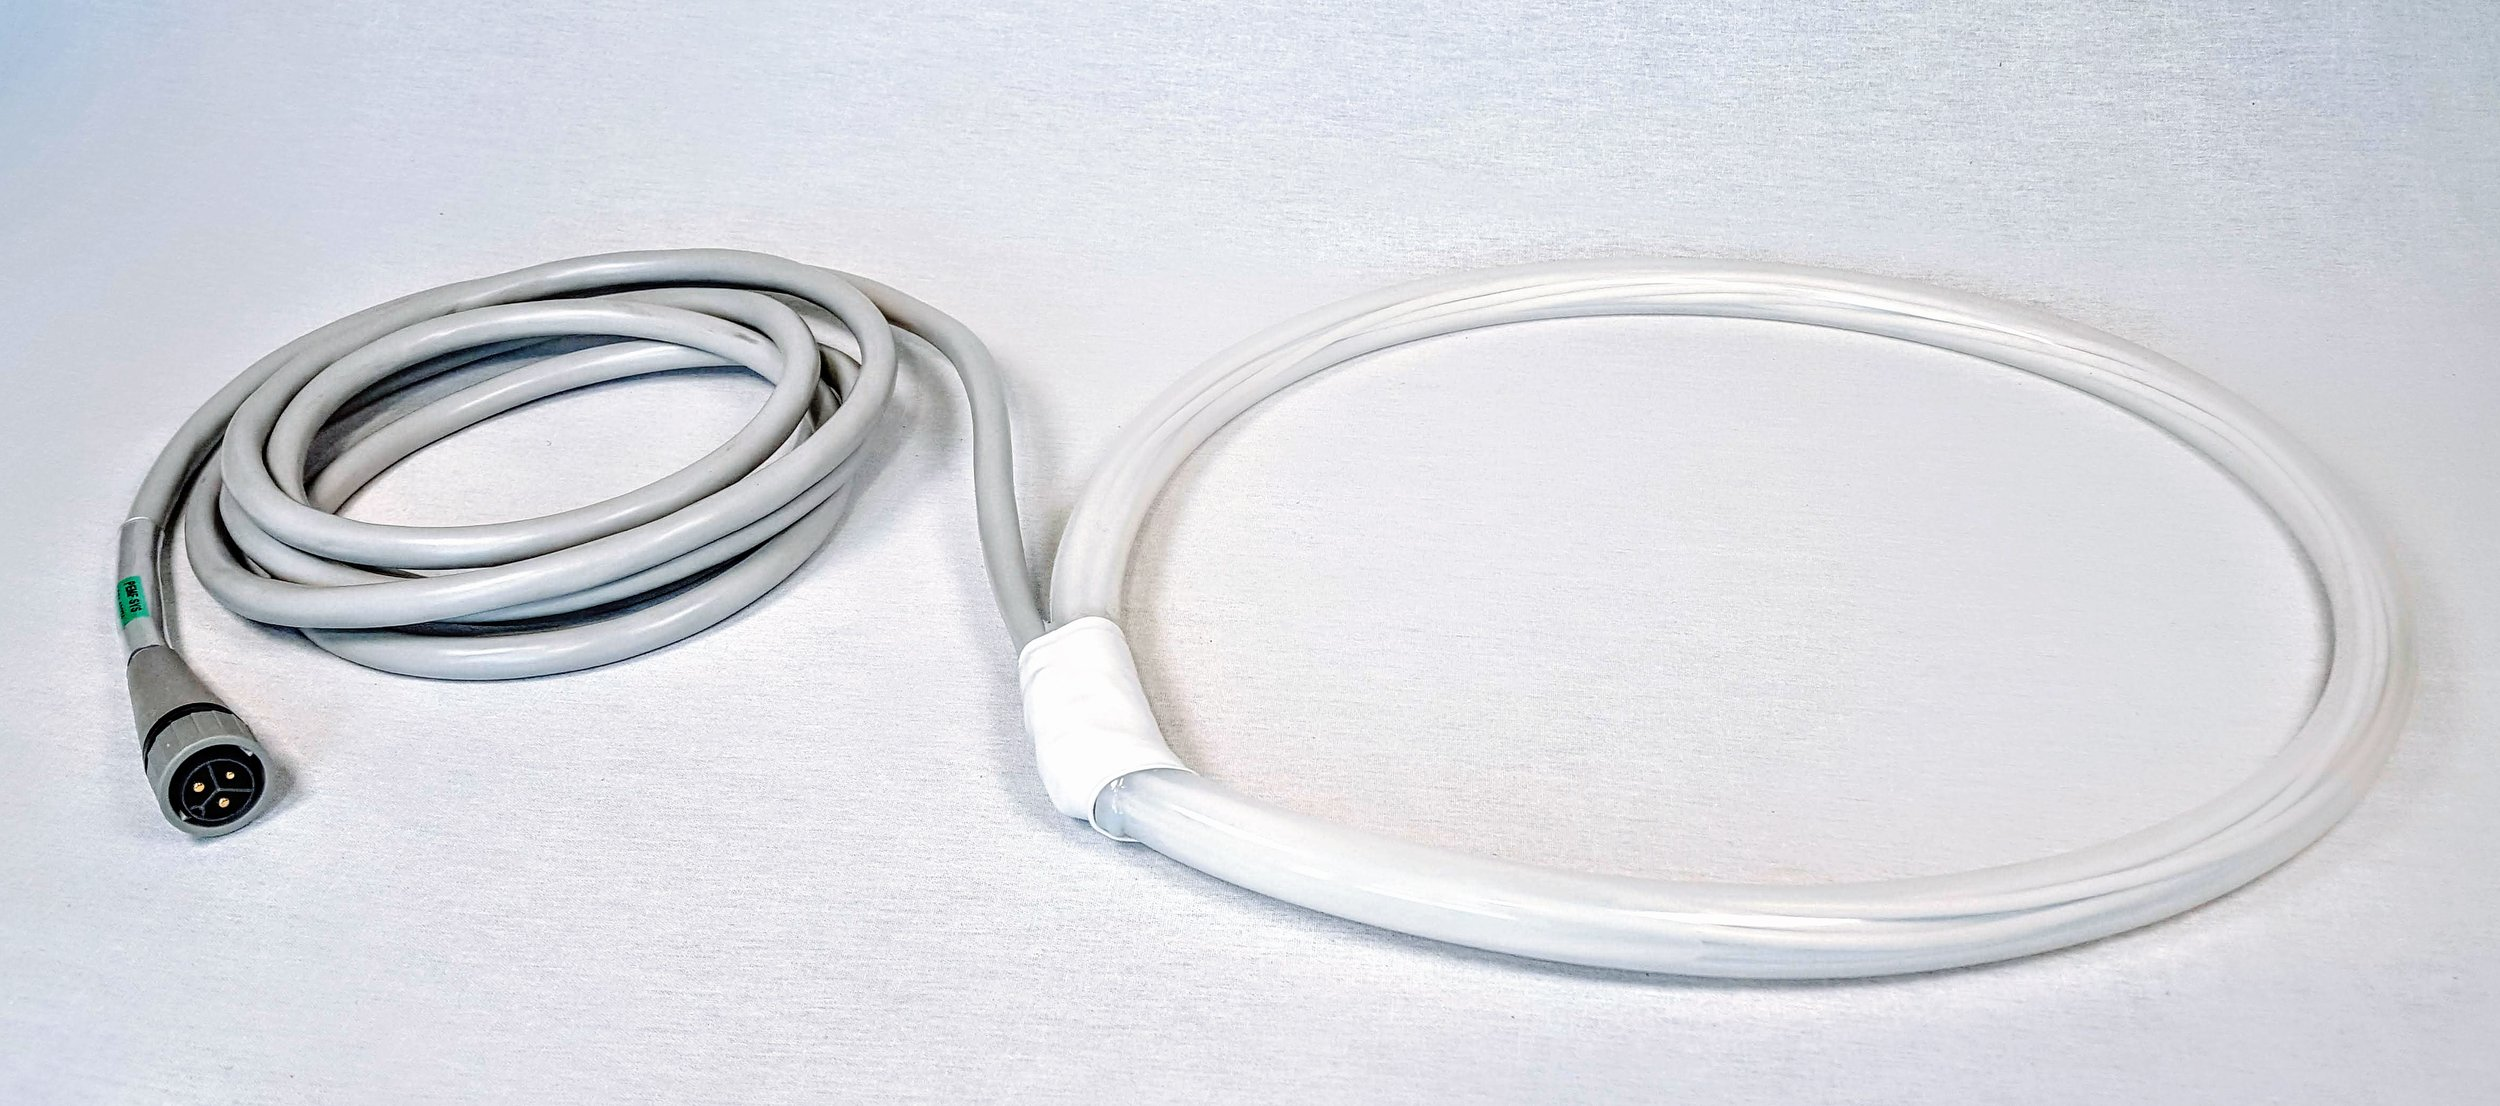 Human Large Loop - $500.00